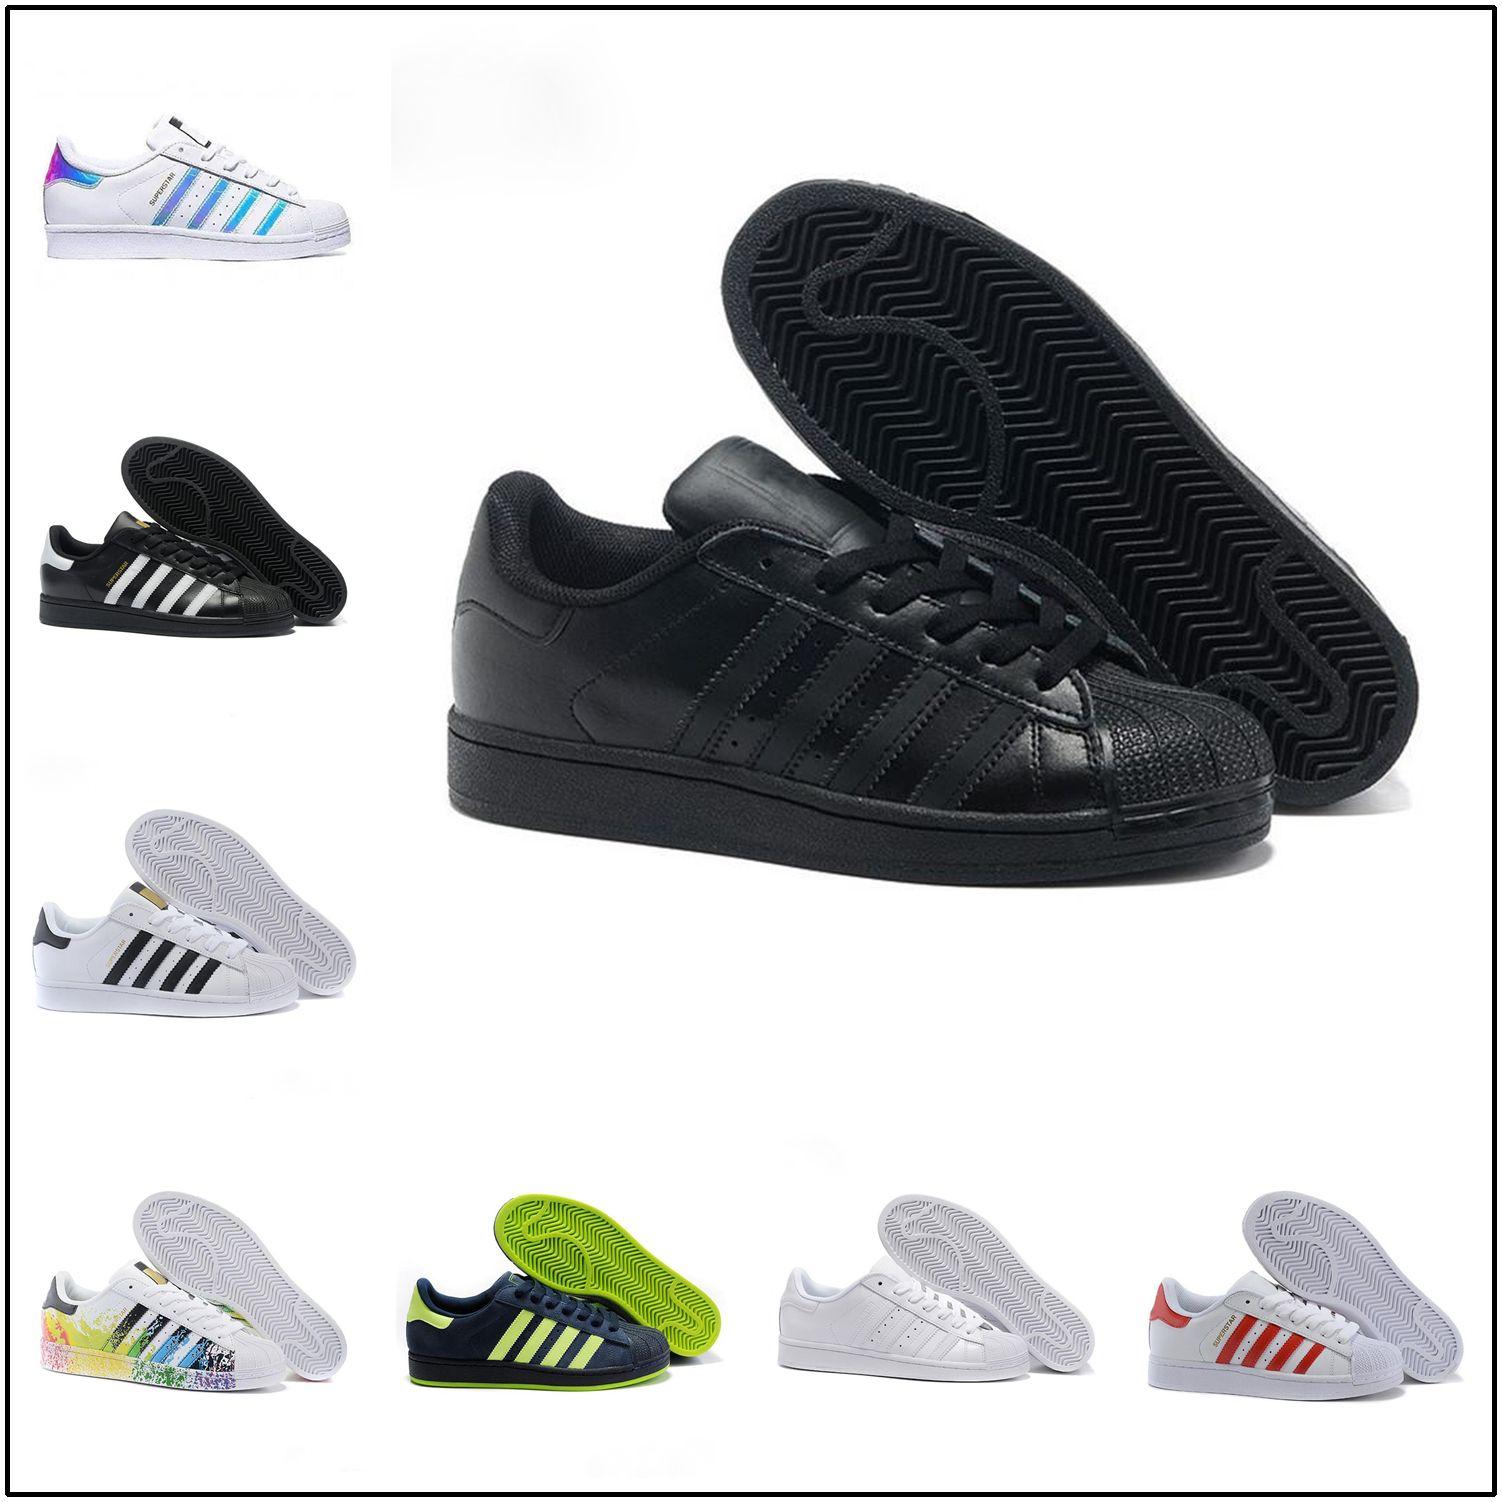 newest b0cb6 6774c 2018 Stan smith Superstar Original White Hologram Iridescent Junior Gold  Superstars Sneakers Originals Women Men Sport Running Shoes